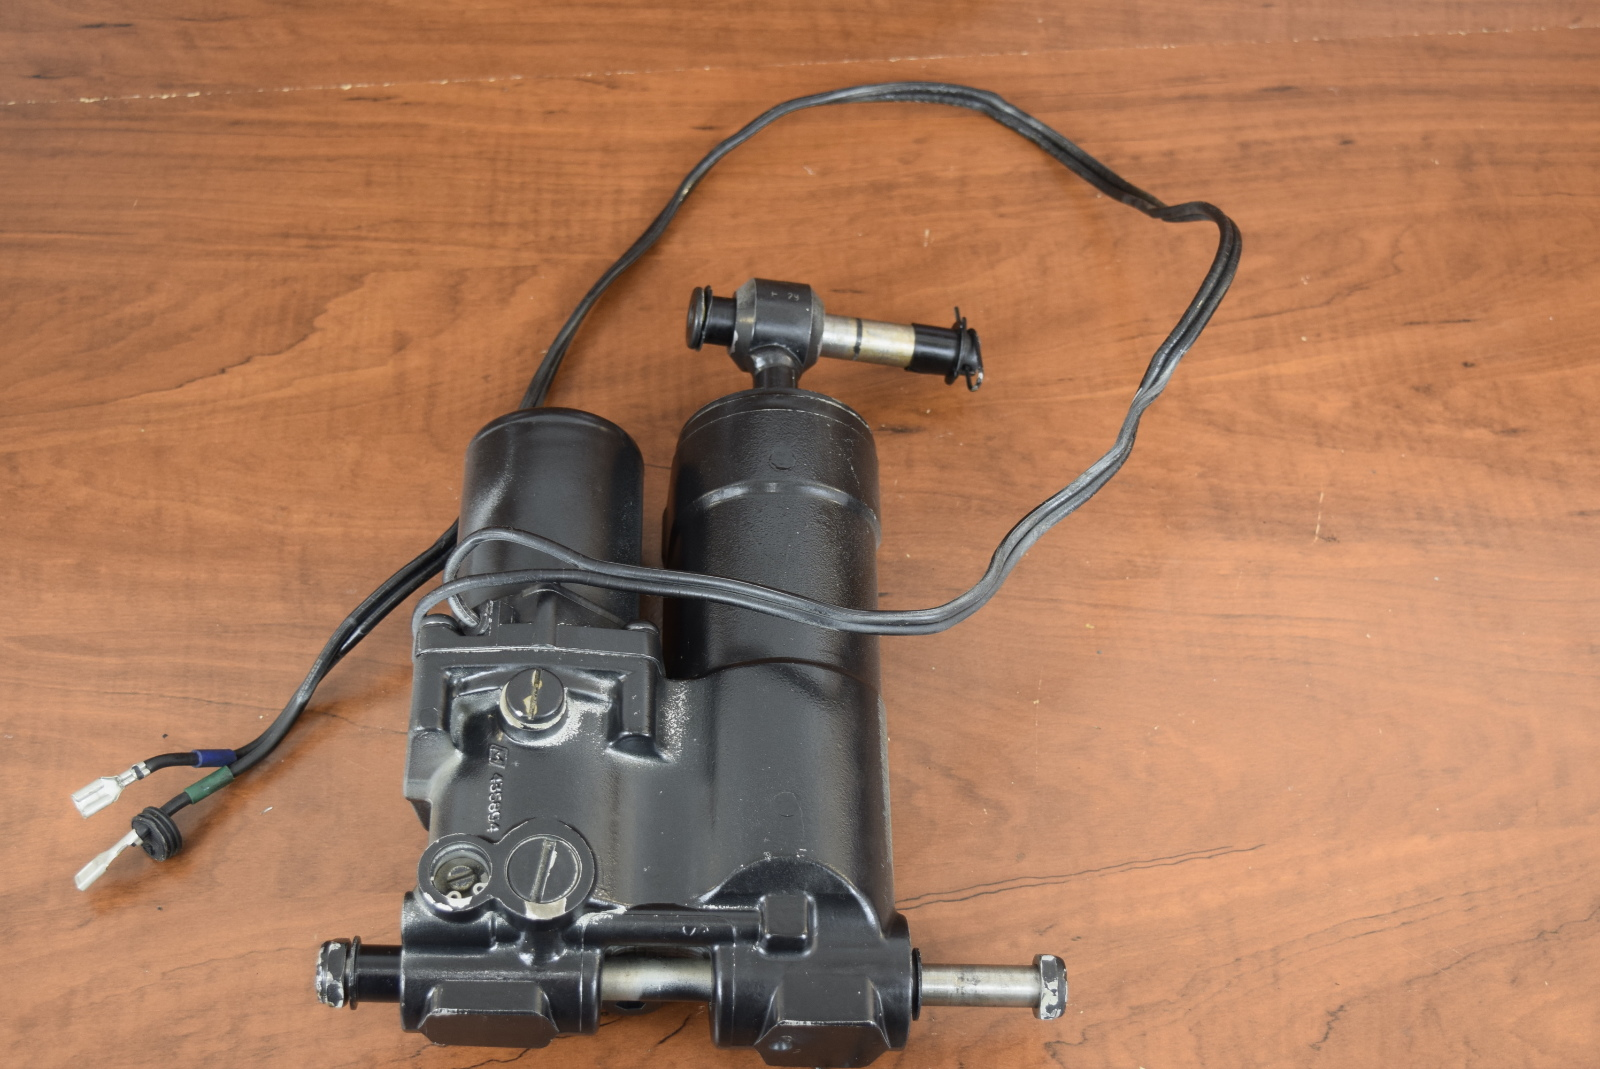 Johnson Evinrude Power Tilt Trim Hydraulic Unit 1989 2005